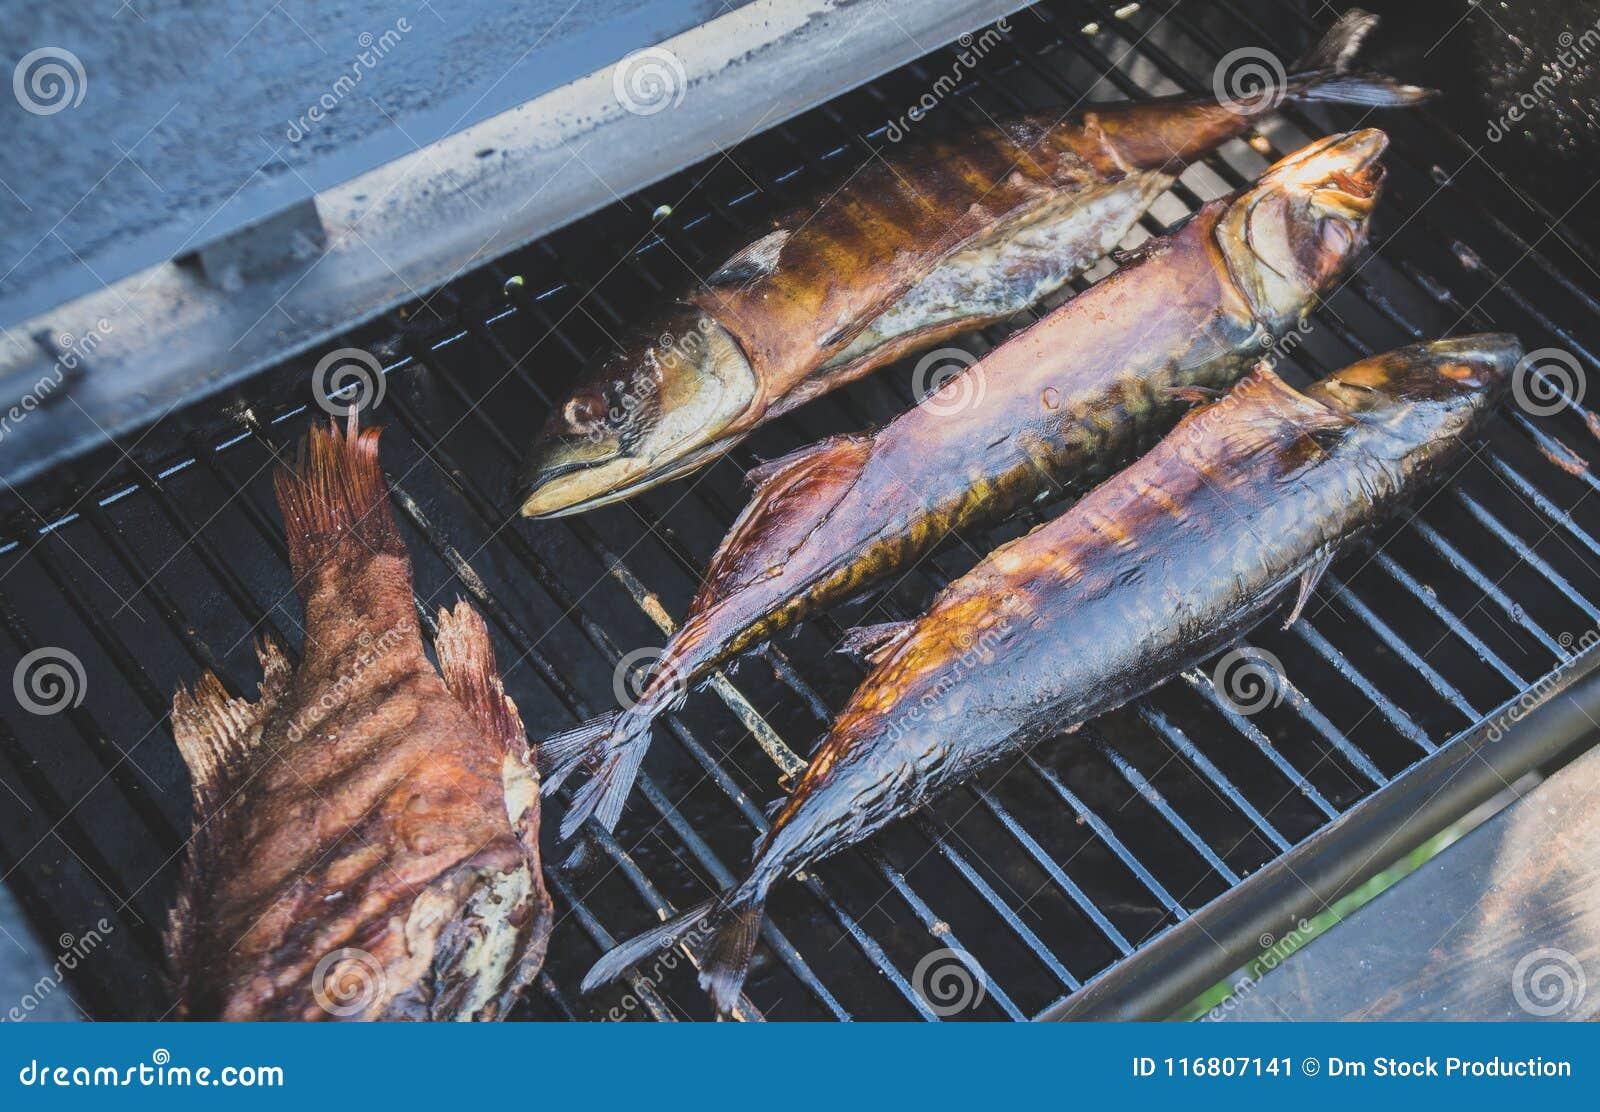 Pesce affumicato nell affumicatoio